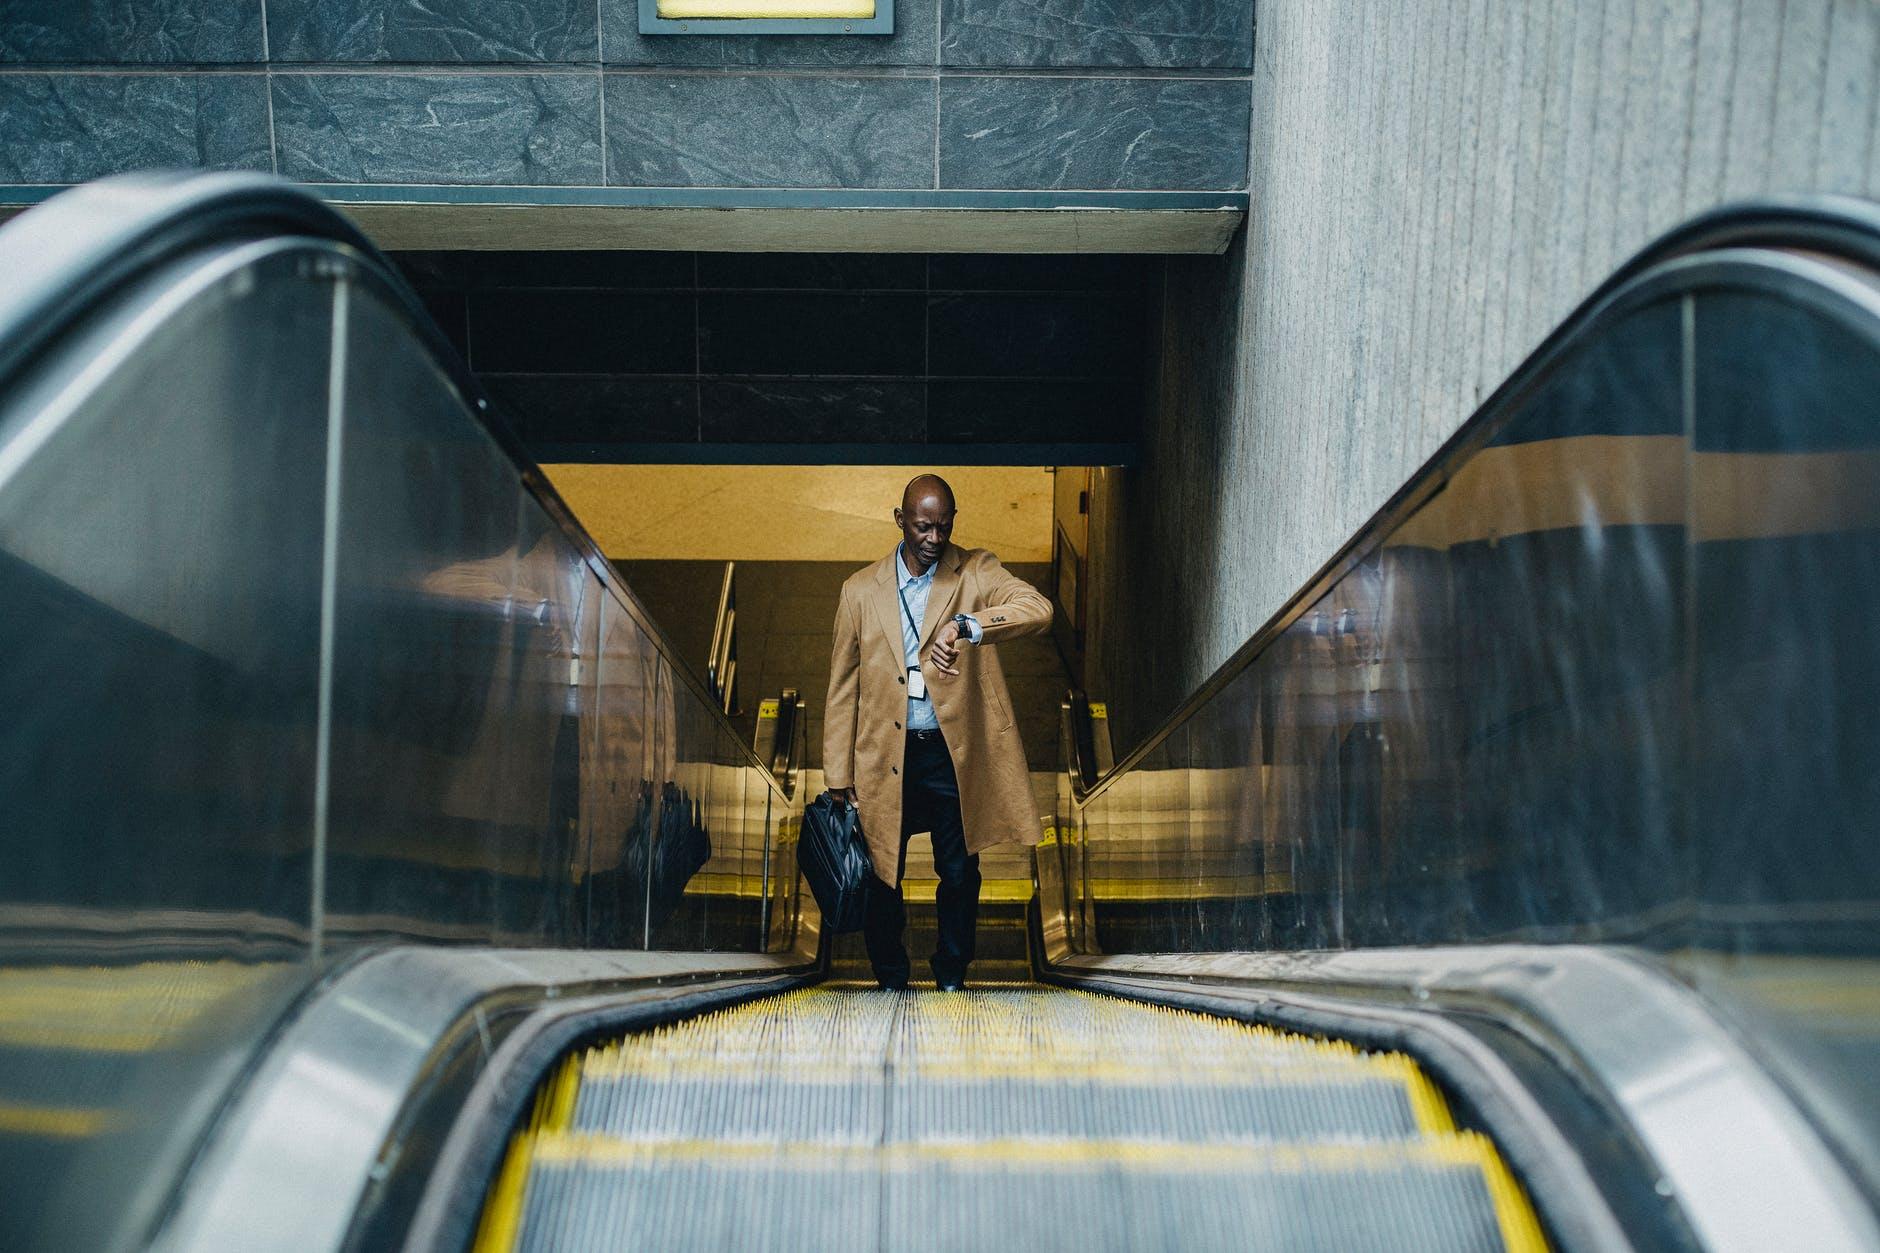 contemplative black businessman riding escalator and looking at wristwatch